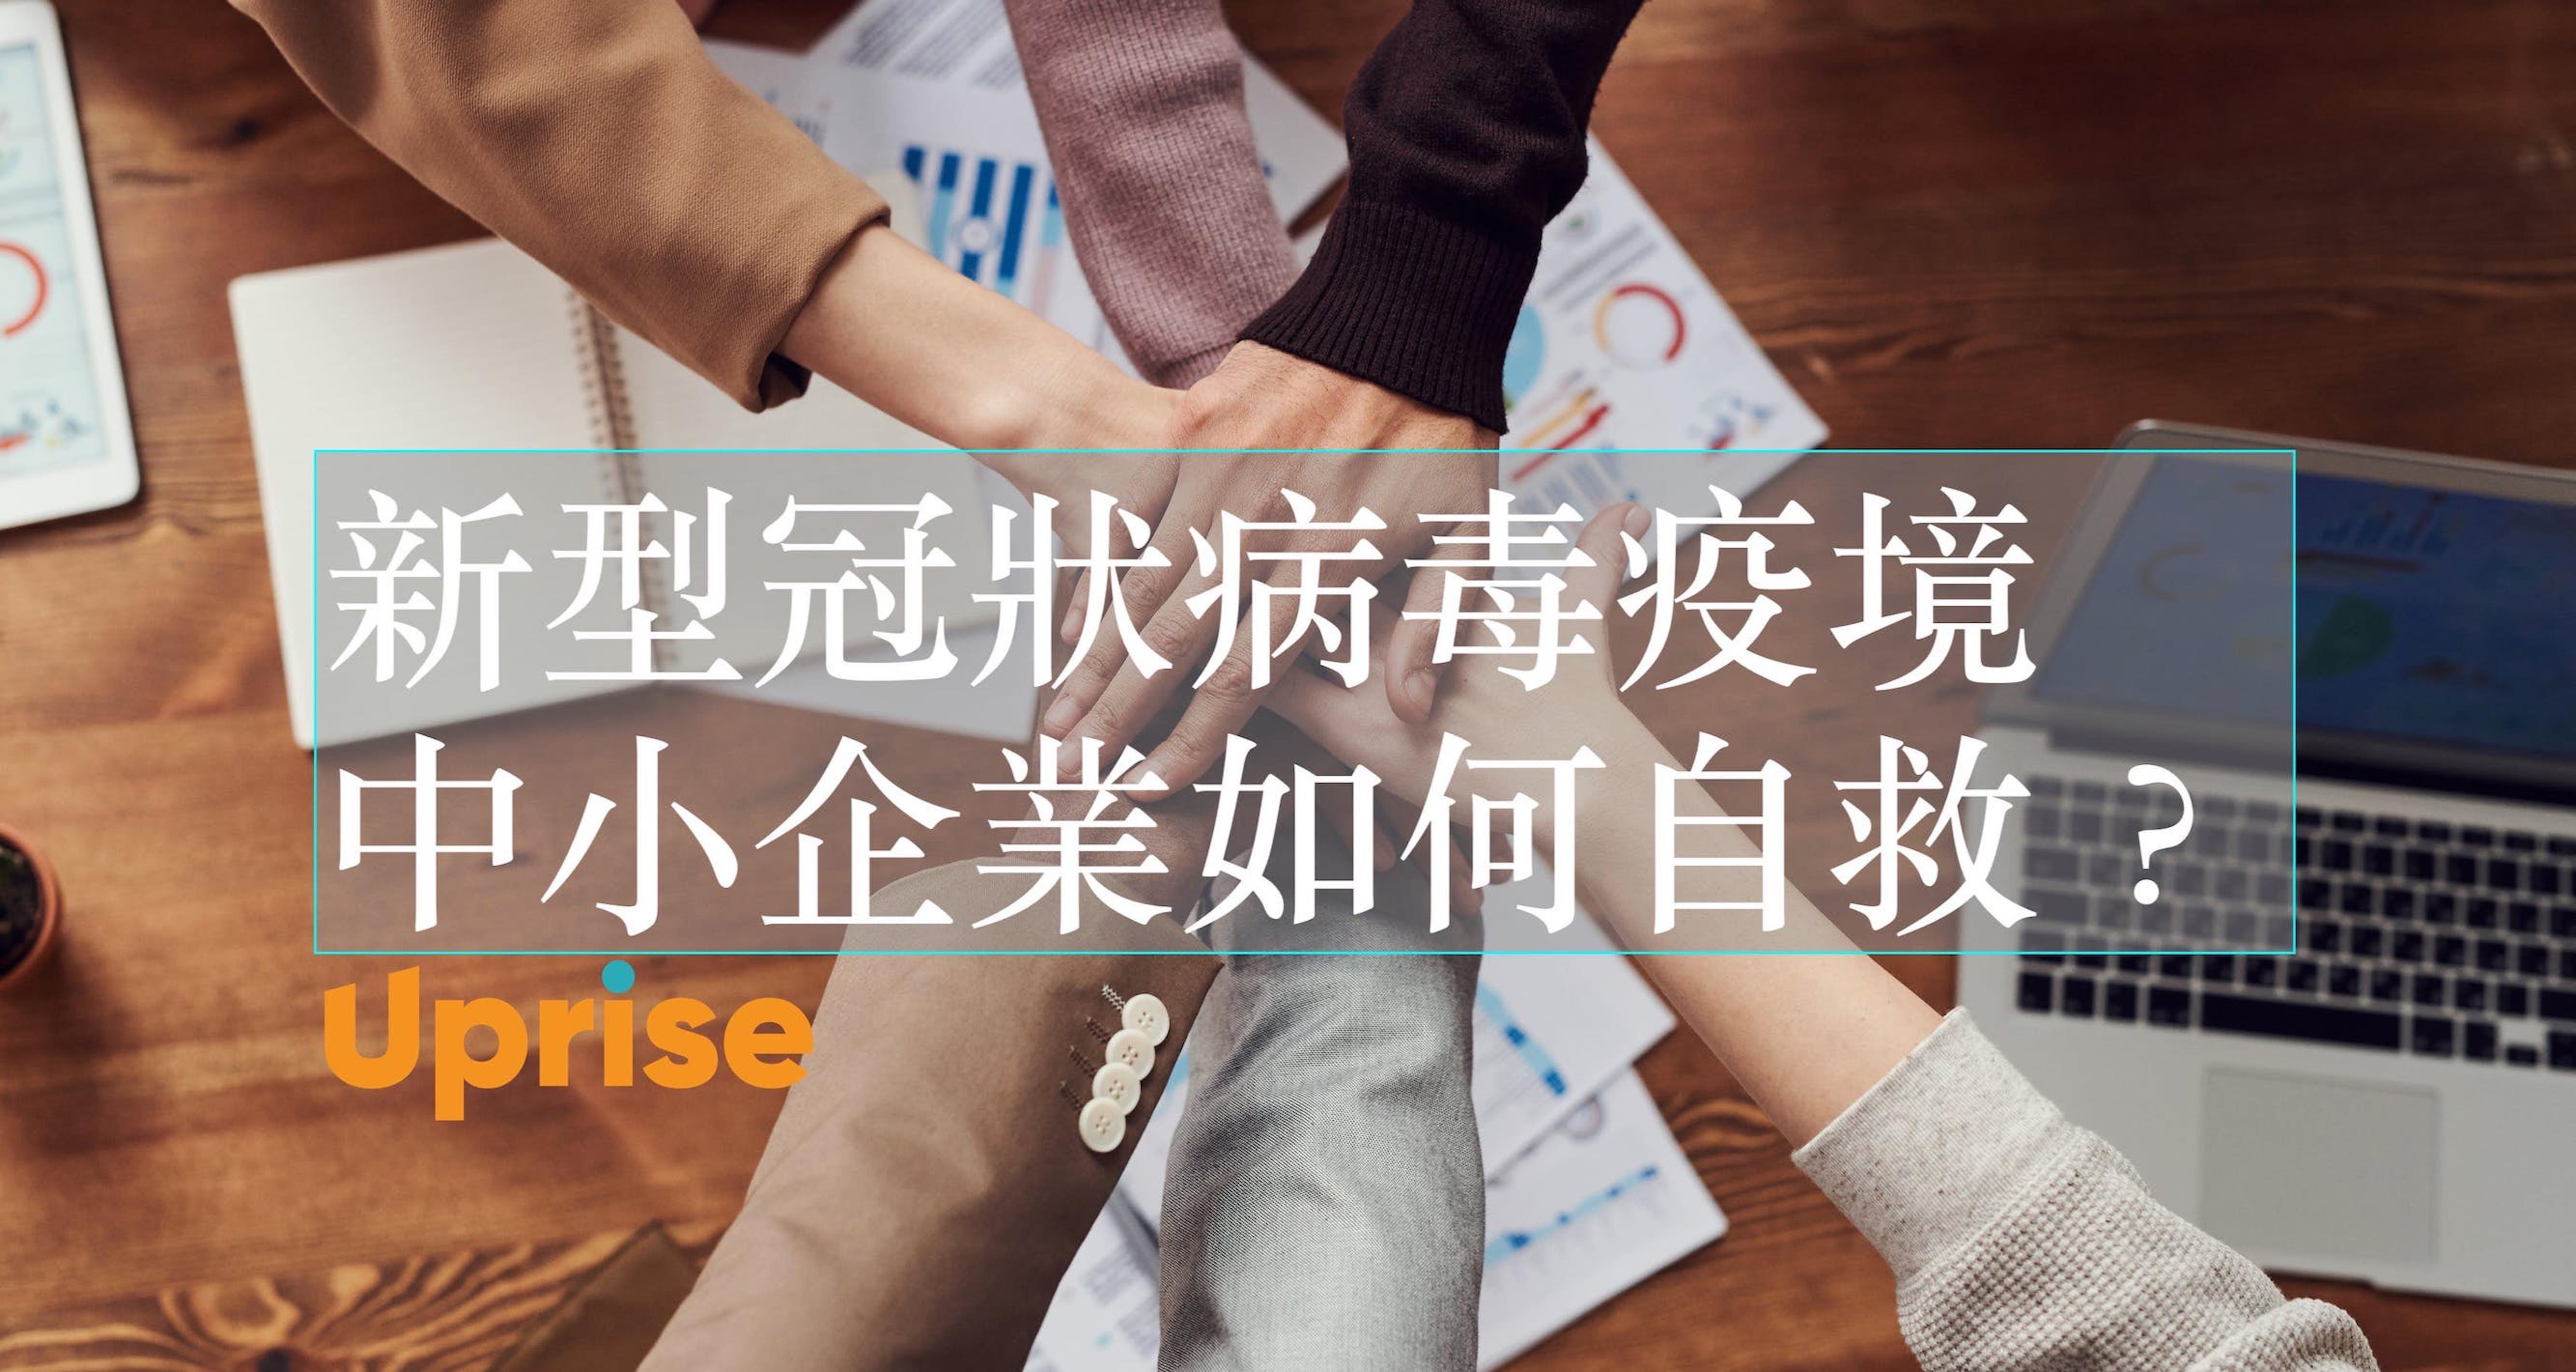 Uprise - Business Insights - 新冠肺炎疫境 香港中小企業自救方法:電子轉型 / 融資擔保 / 企業貸款